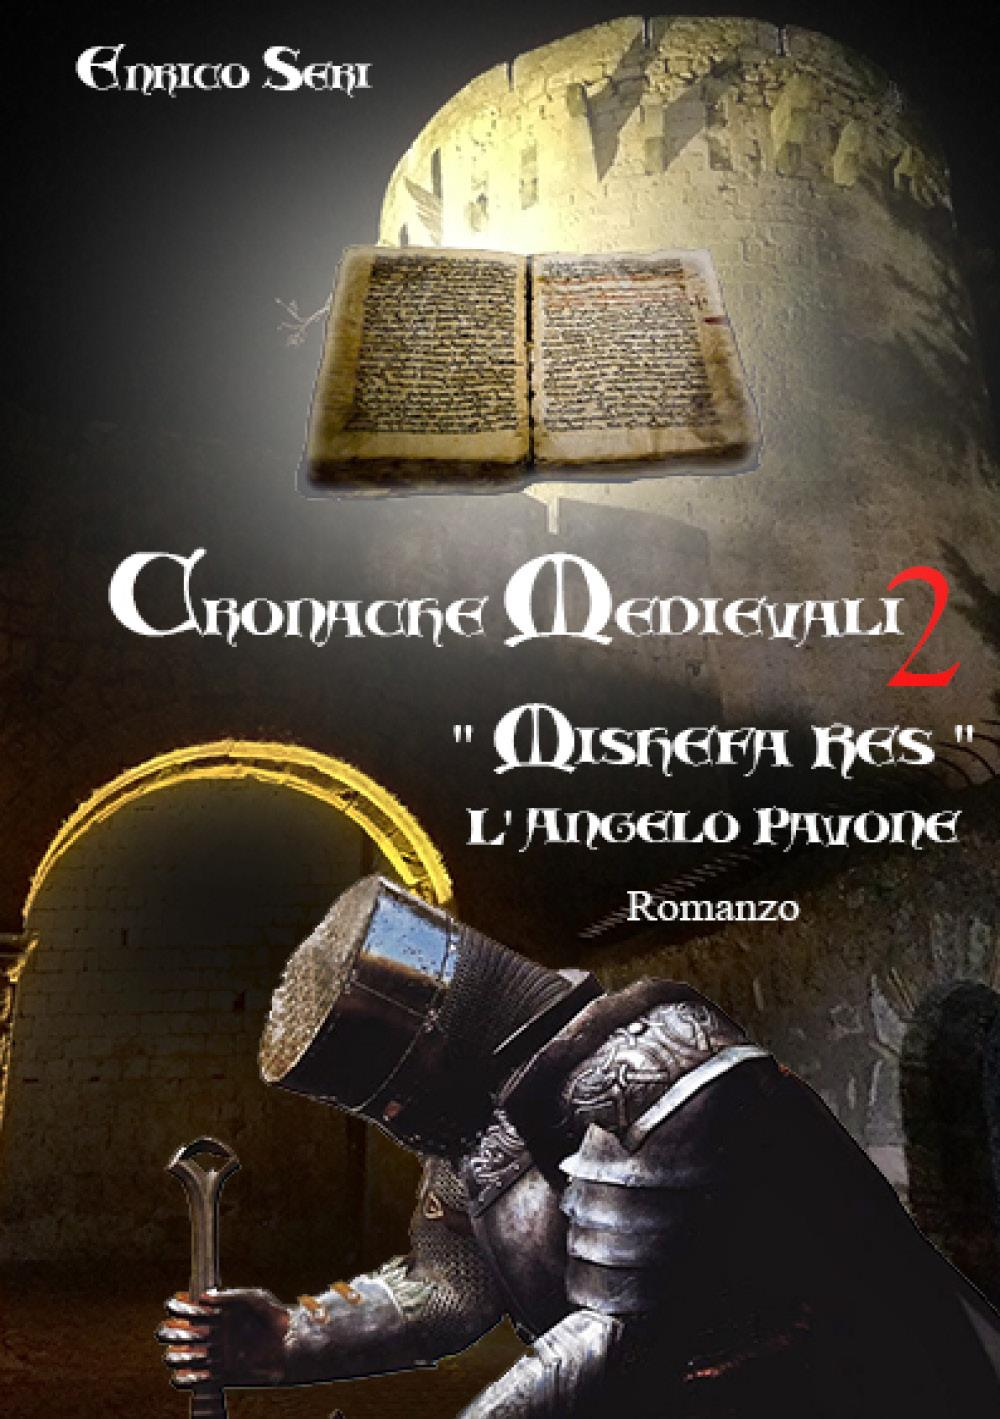 Cronache Medievali 2 - Mishefa Res - L'Angelo Pavone